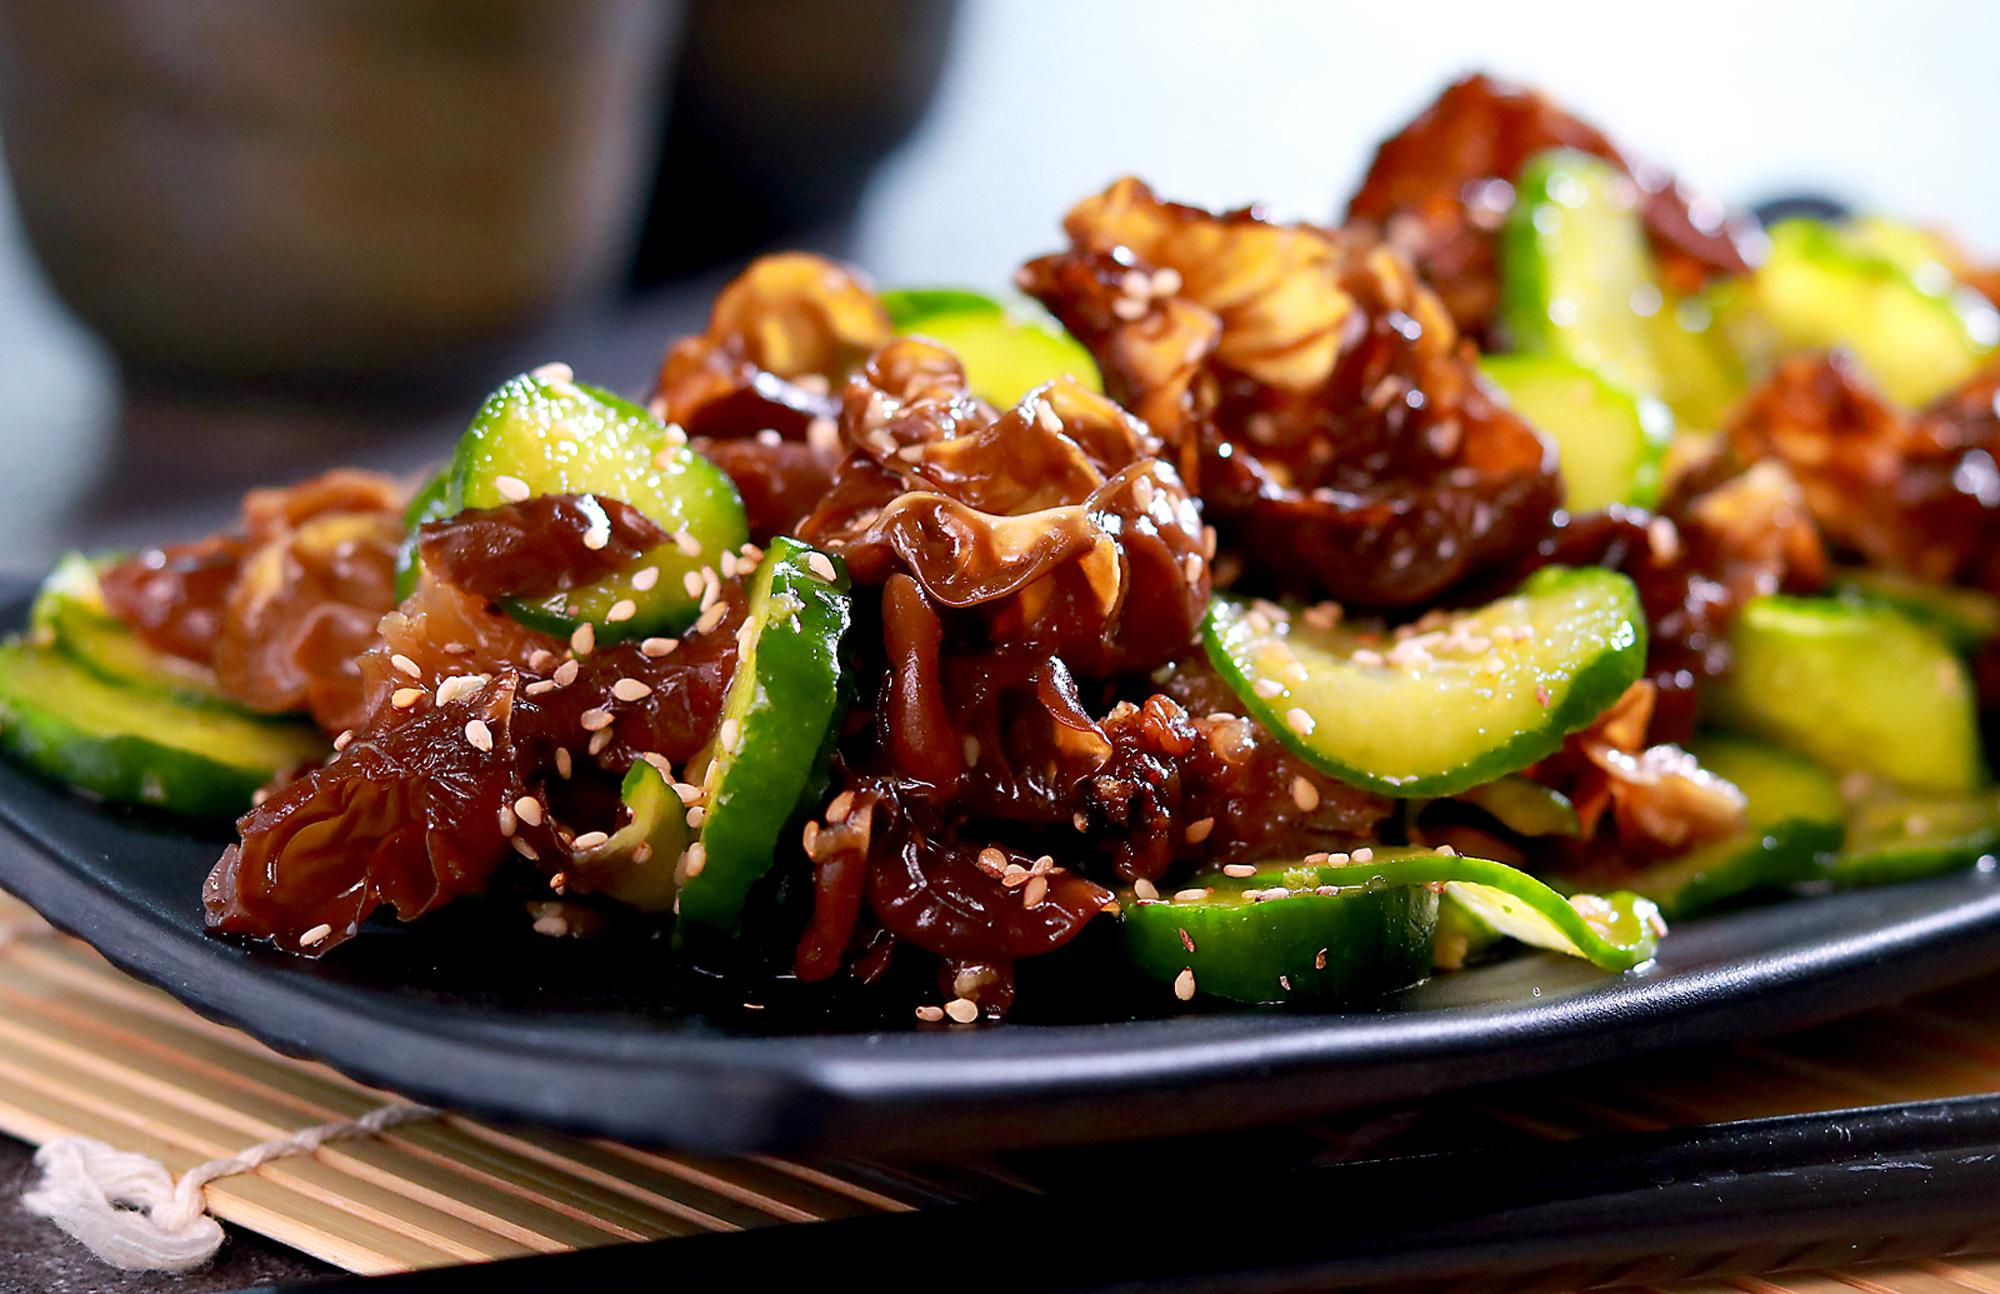 Chilled Cucumber and Wood Ear Mushroom Salad Recipe | Allrecipes